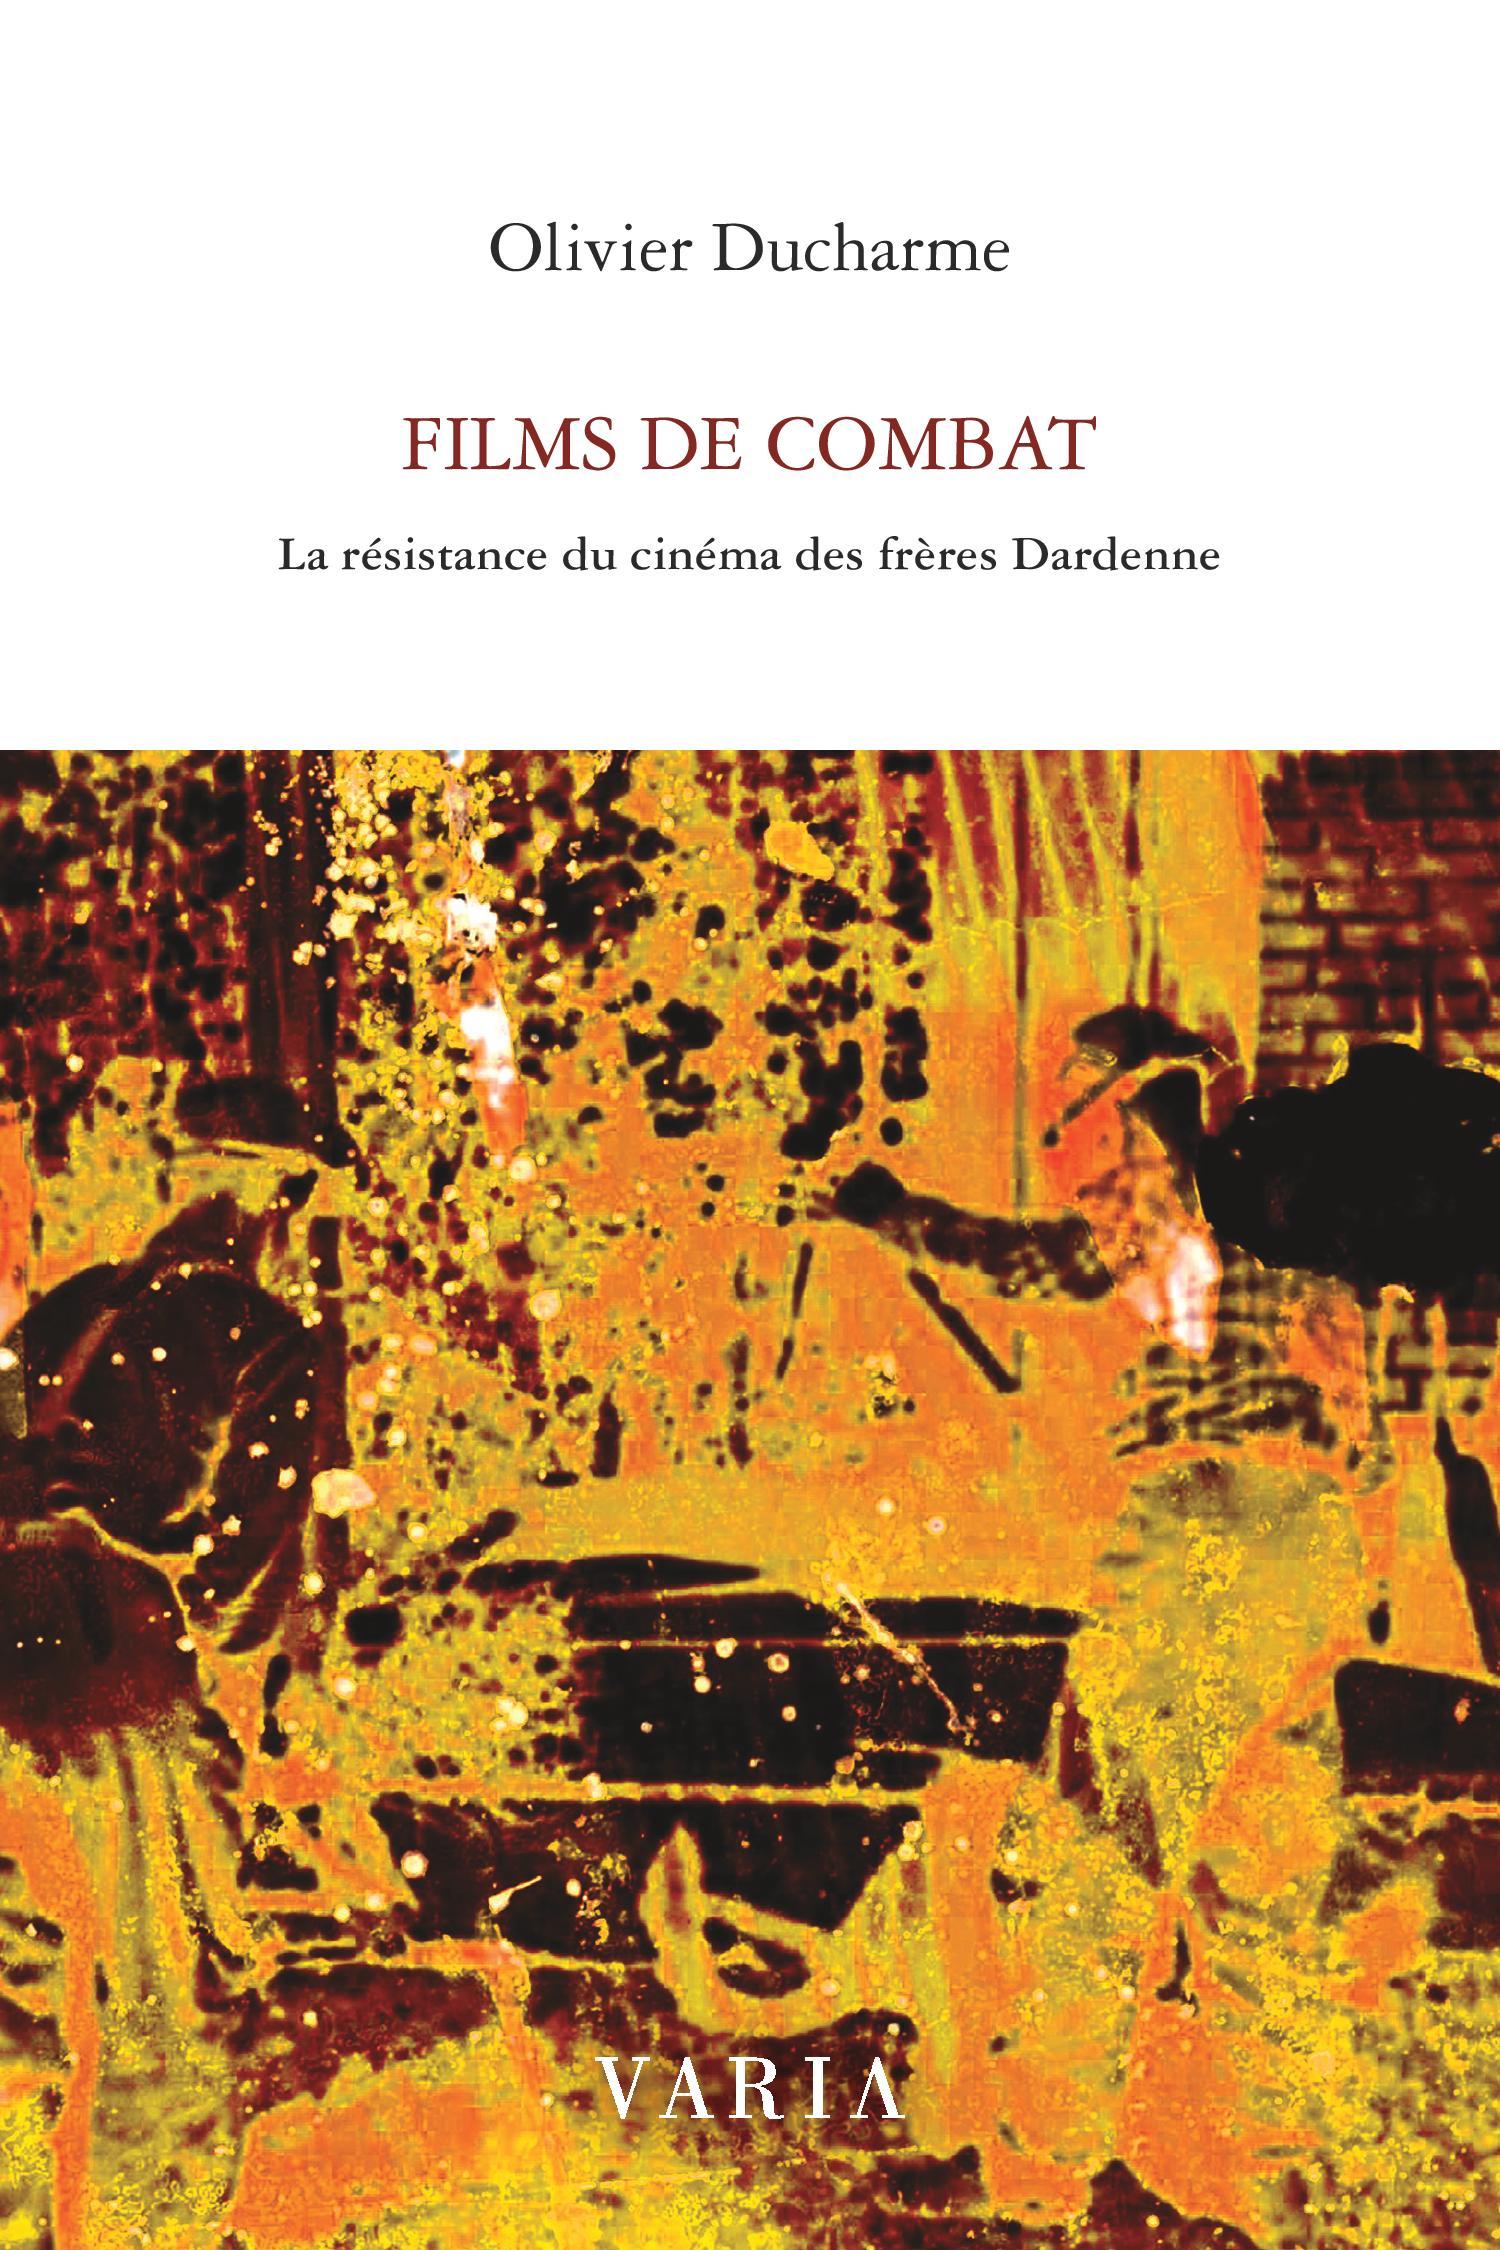 Films de combat